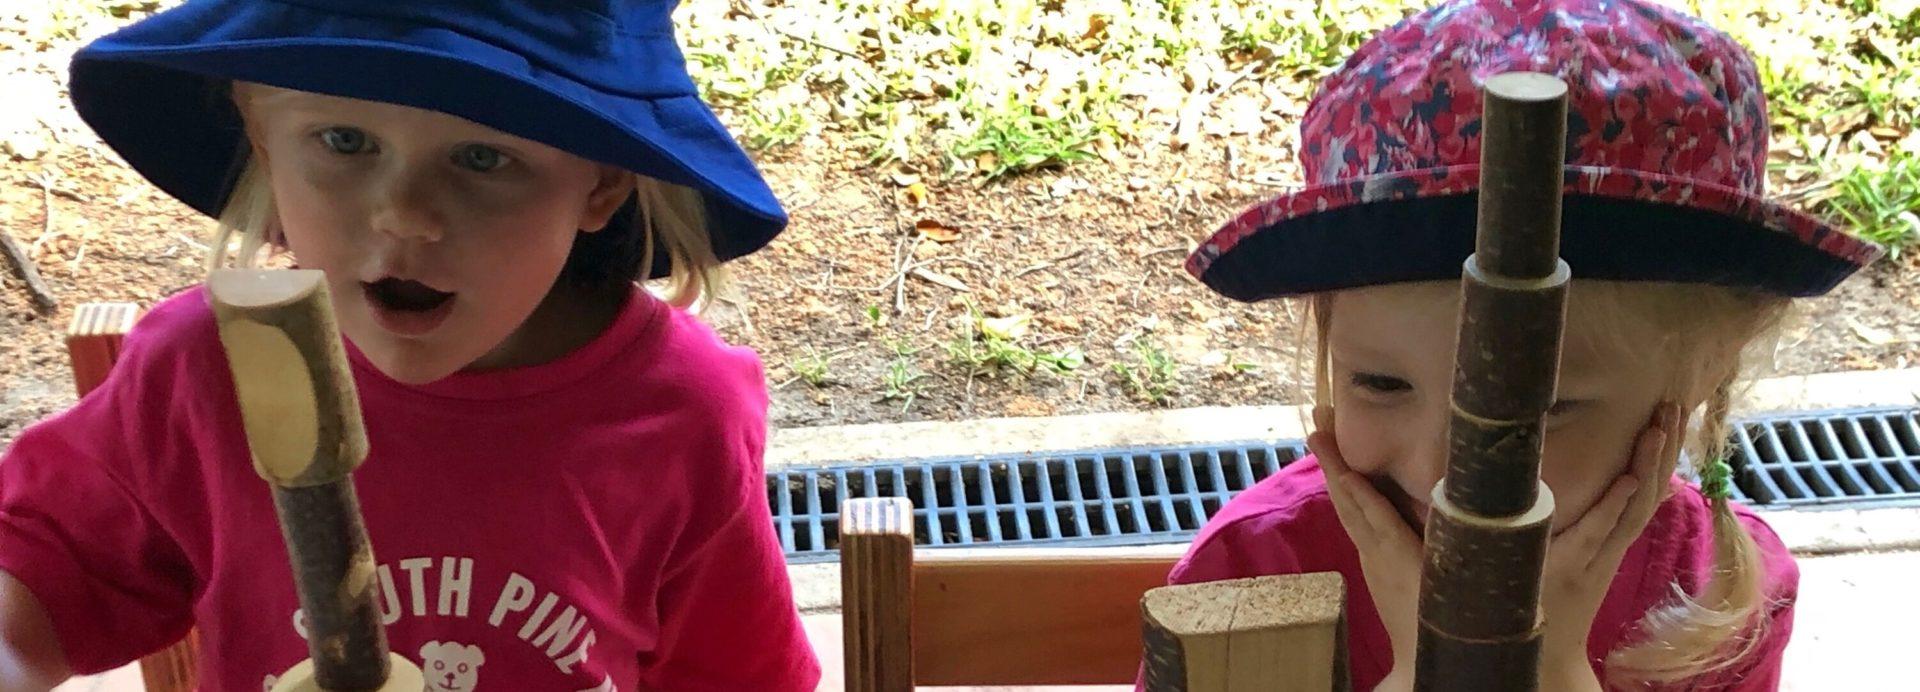 South Pine Community kindergarten